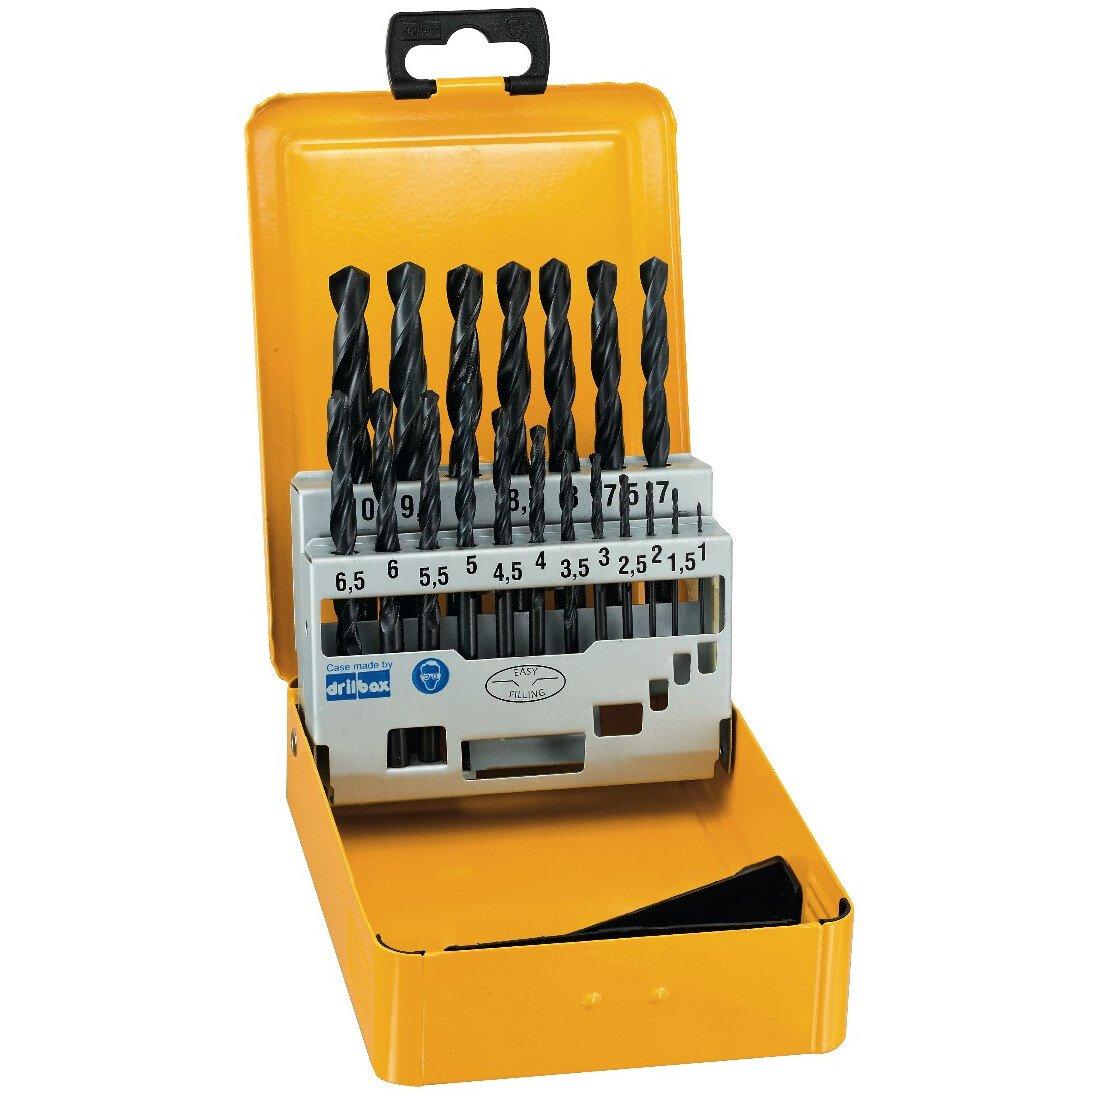 DeWalt DT5913-QZ HSS-R DIN 338 Jobber Drill Bit Sets 19pc